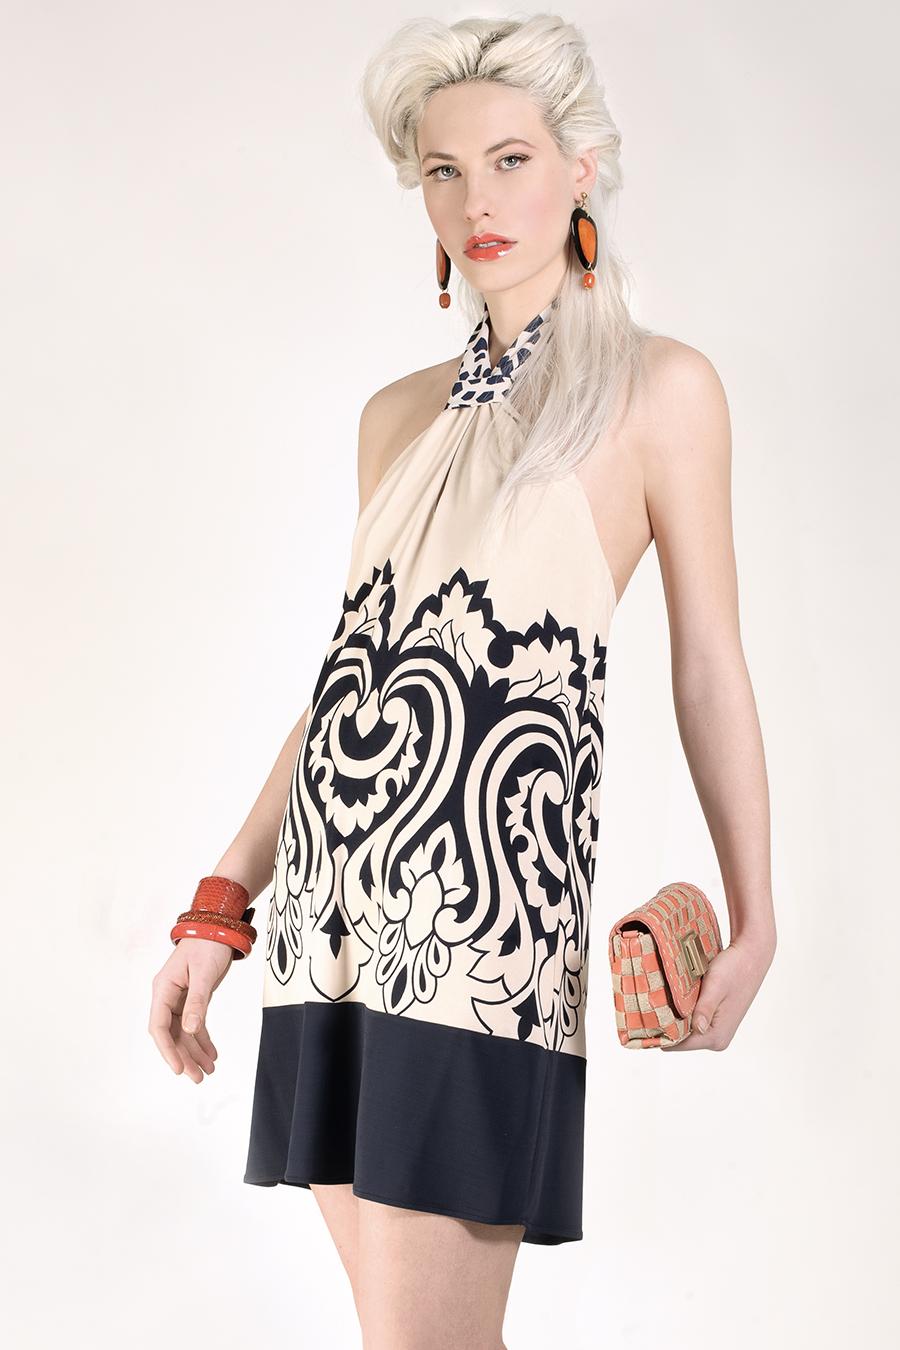 Fashion Editorial - Lorena White